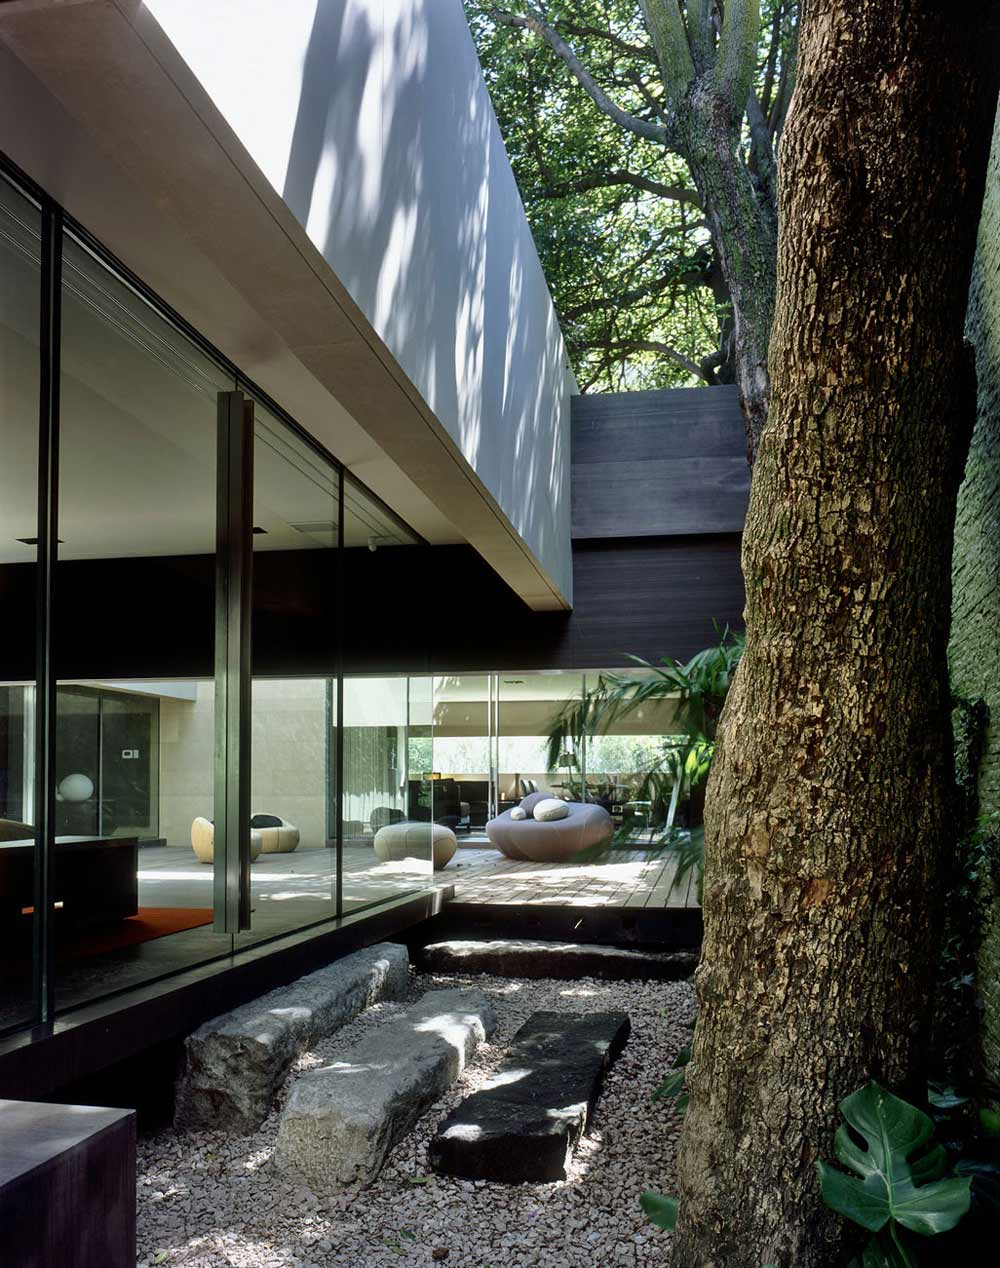 Glass Walls, Casa Reforma by Central de Arquitectura